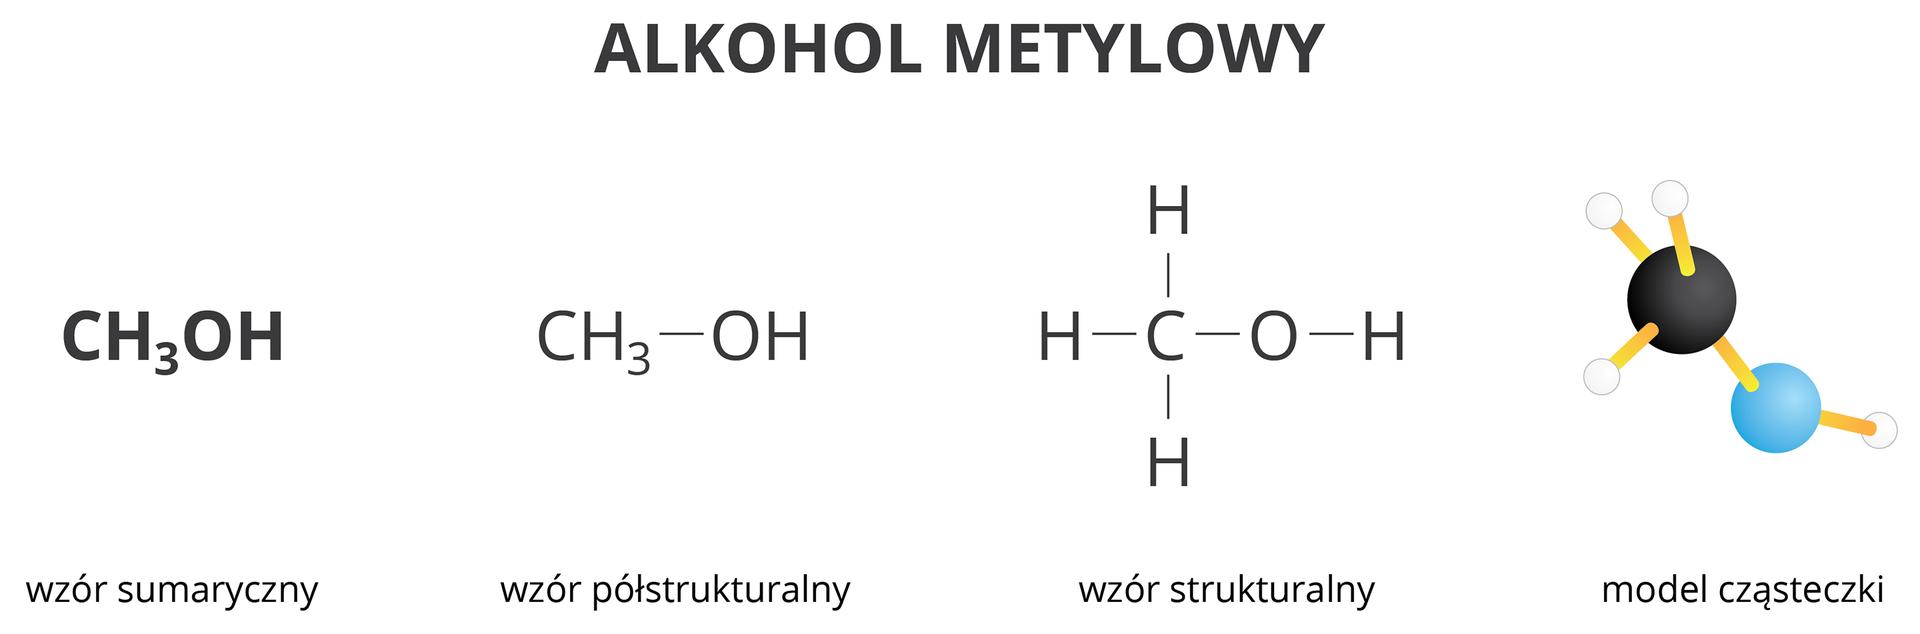 Model iwzory alkoholu metylowego